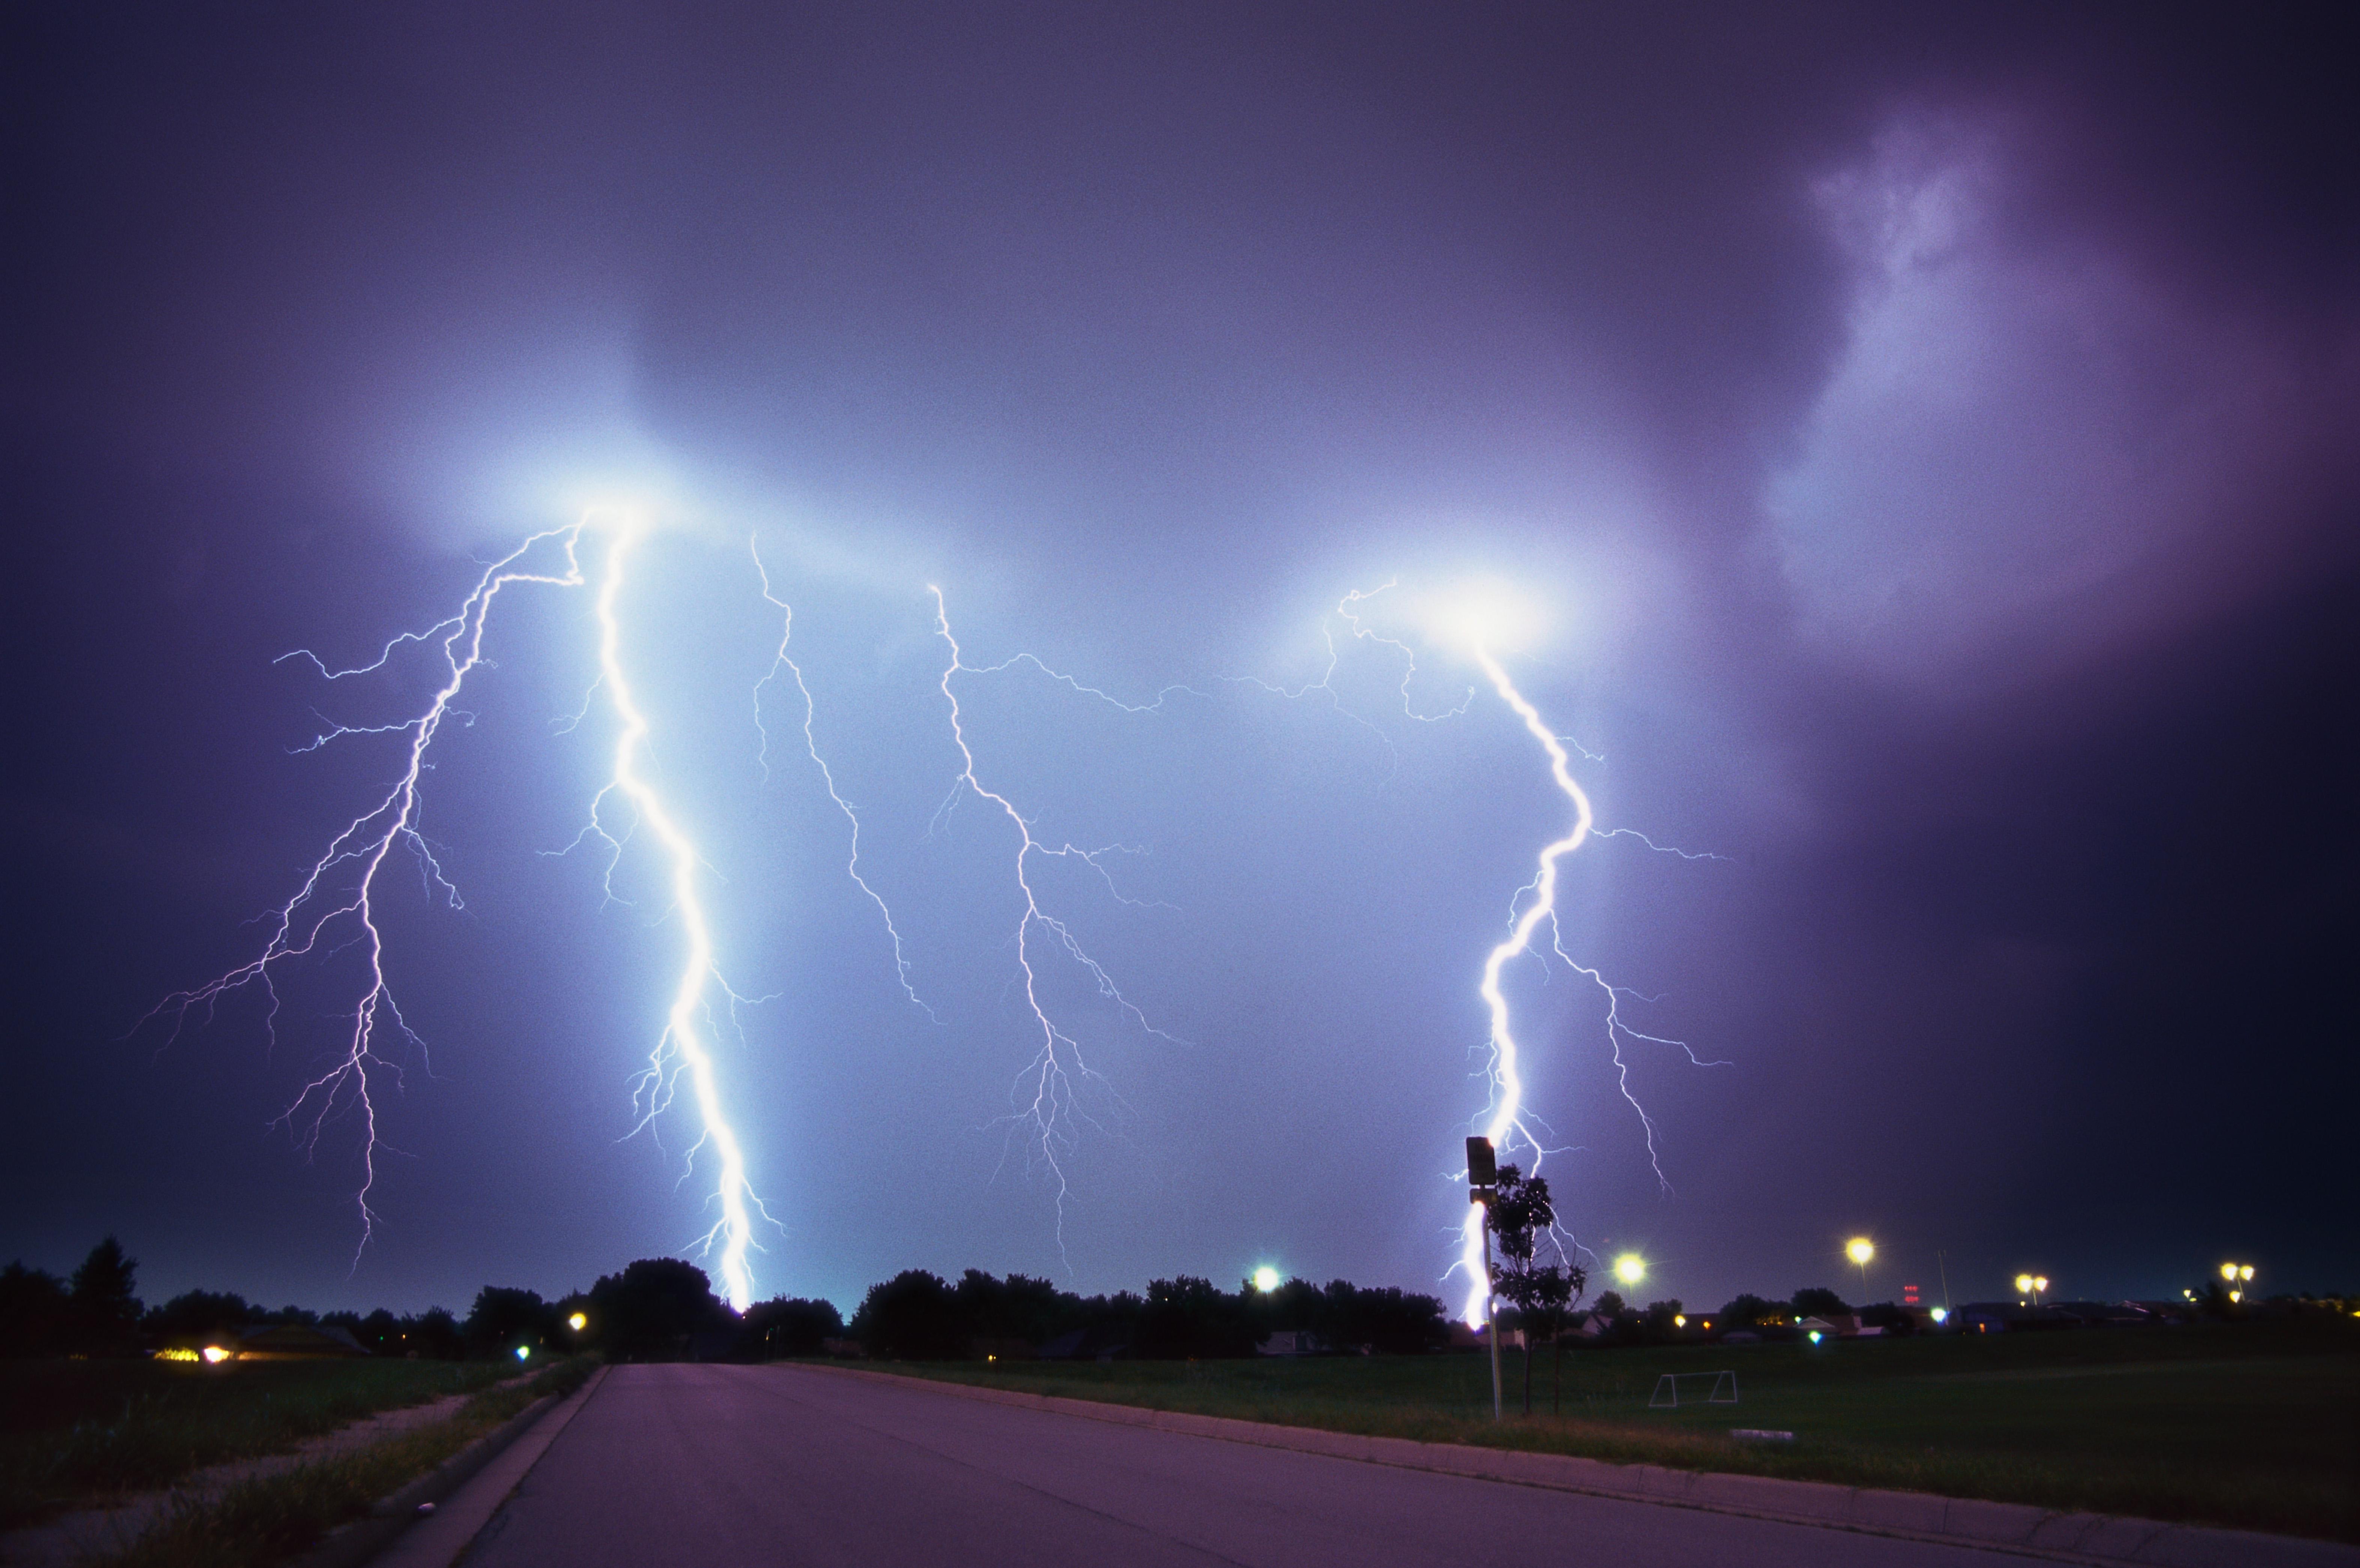 tungsten shot of a bolt of lightning hitting the ground